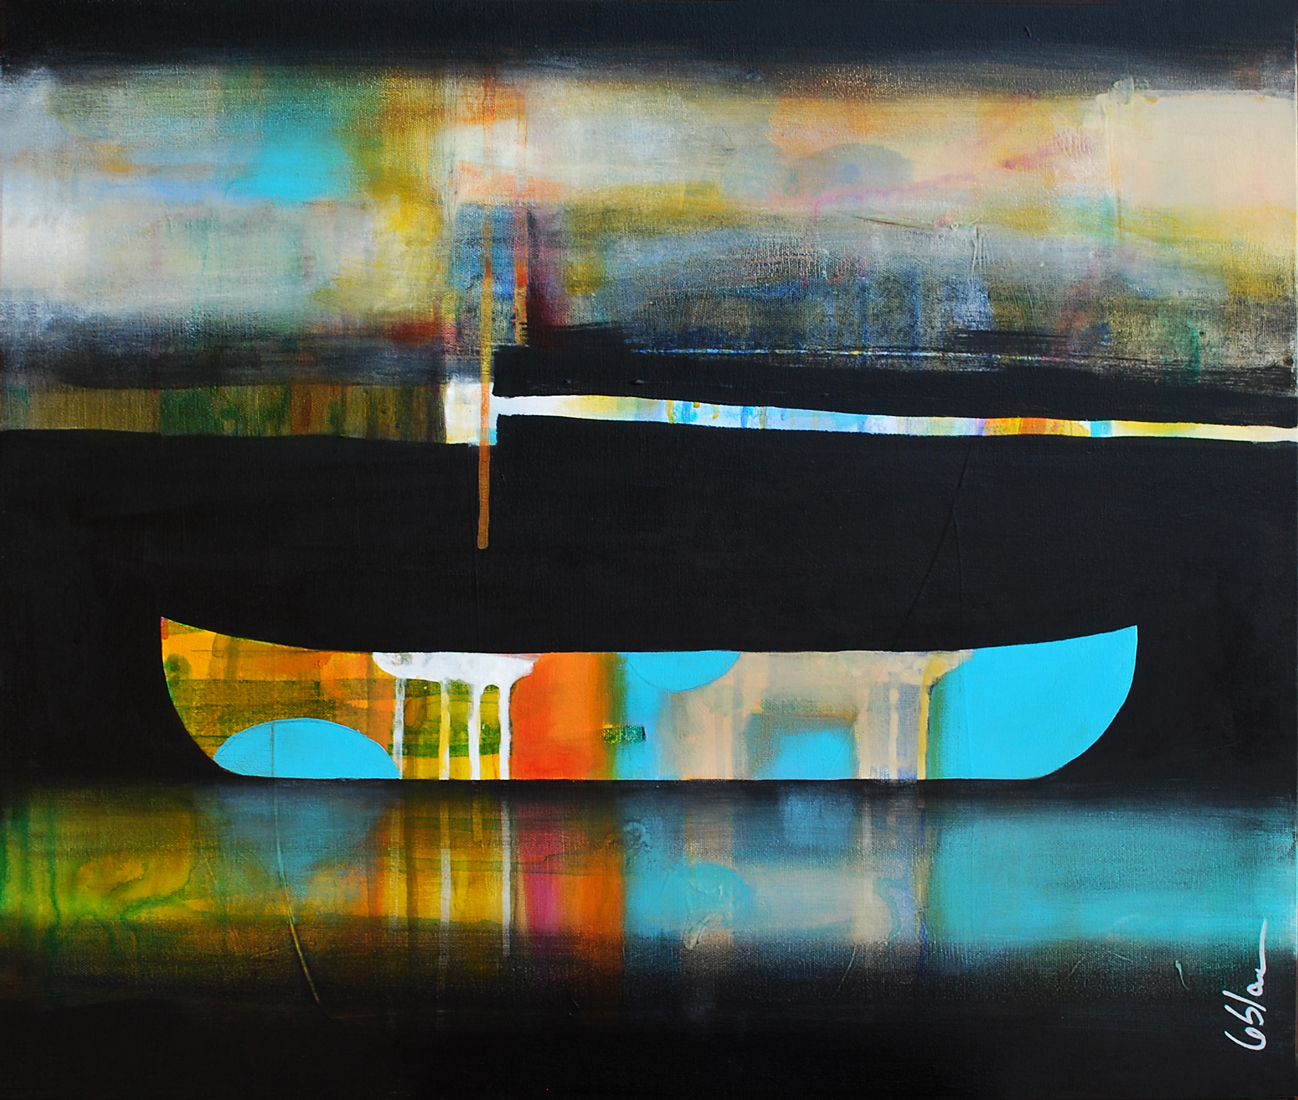 C'est certain il y a quelque chose, mixed media canoe painting by Sylvain Leblanc | Effusion Art Gallery + Cast Glass Studio, Invermere BC